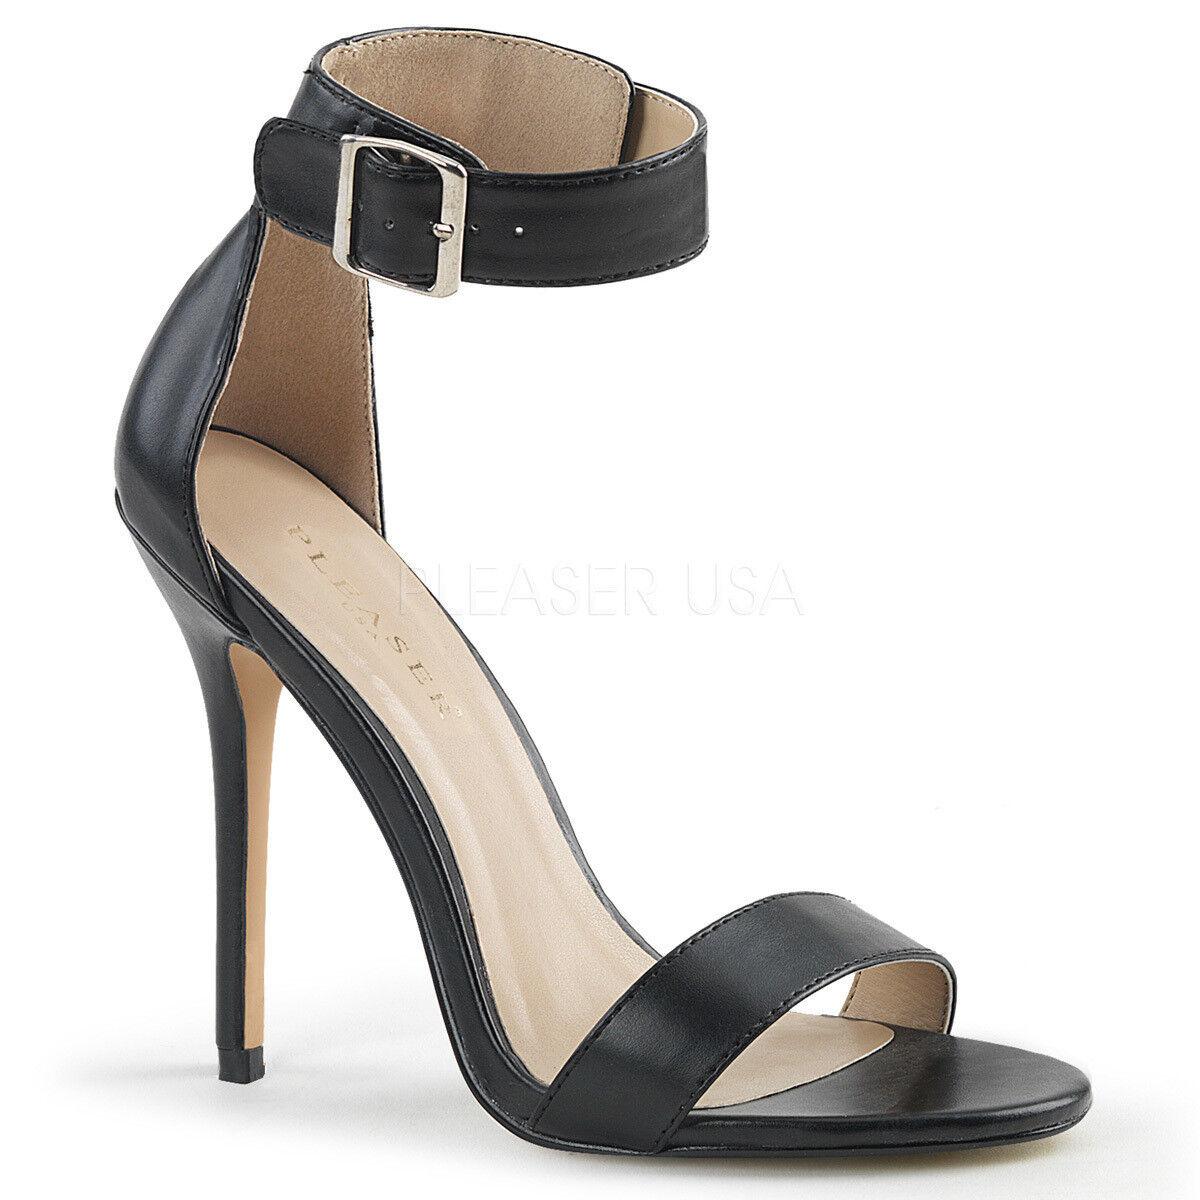 Amuse-10 Pleaser Damen Stiletto High Heels Sandaletten schwarz Lederoptik 35-47